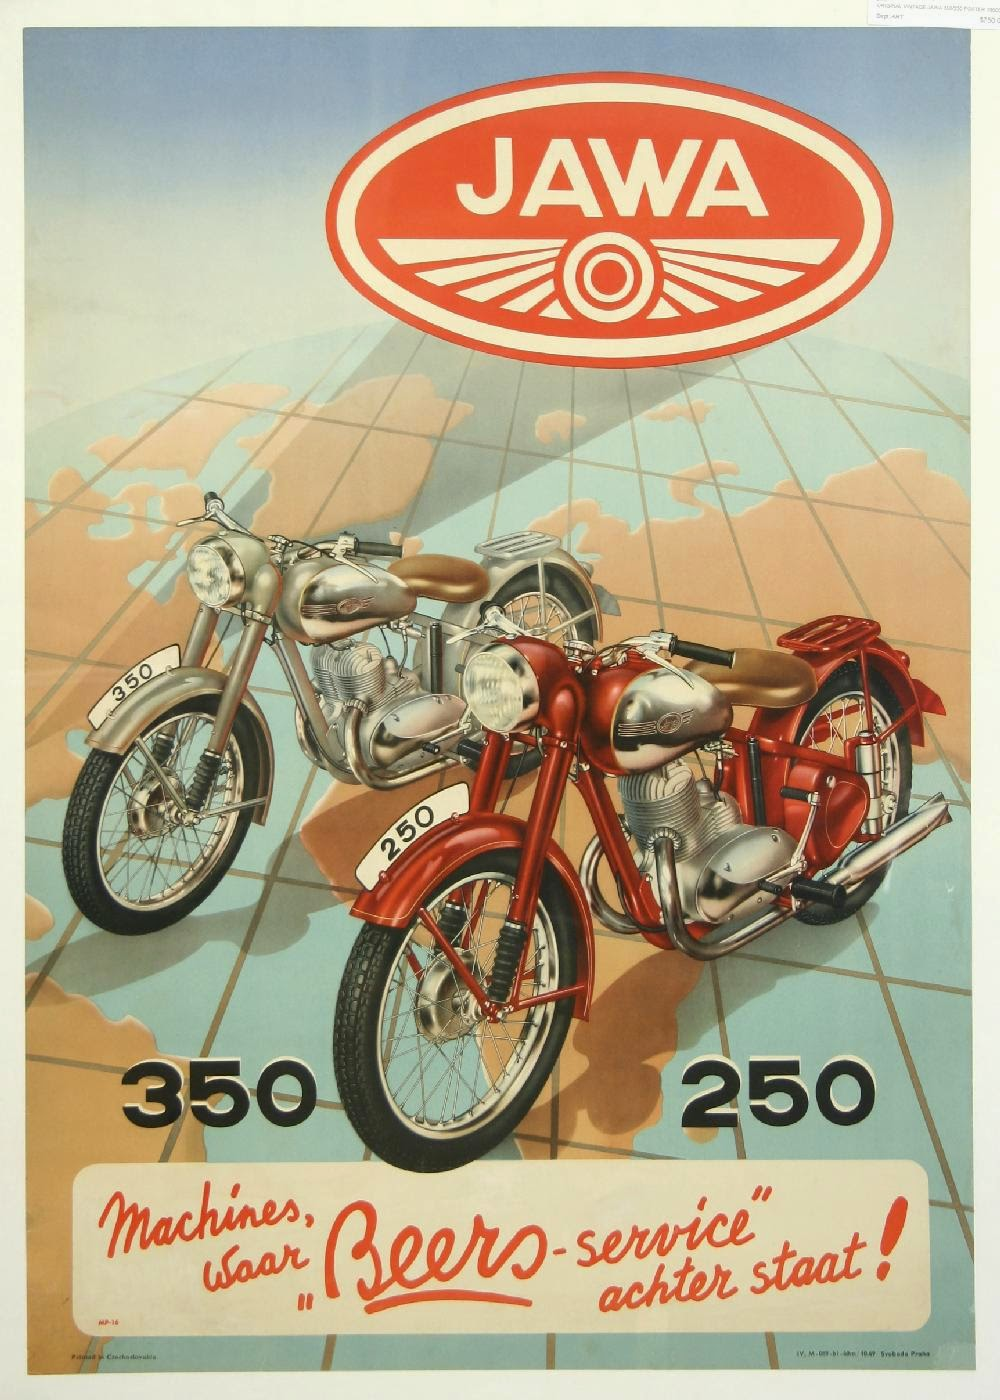 Plakat reklamowy Jawa 250, 350 (niemiecki)